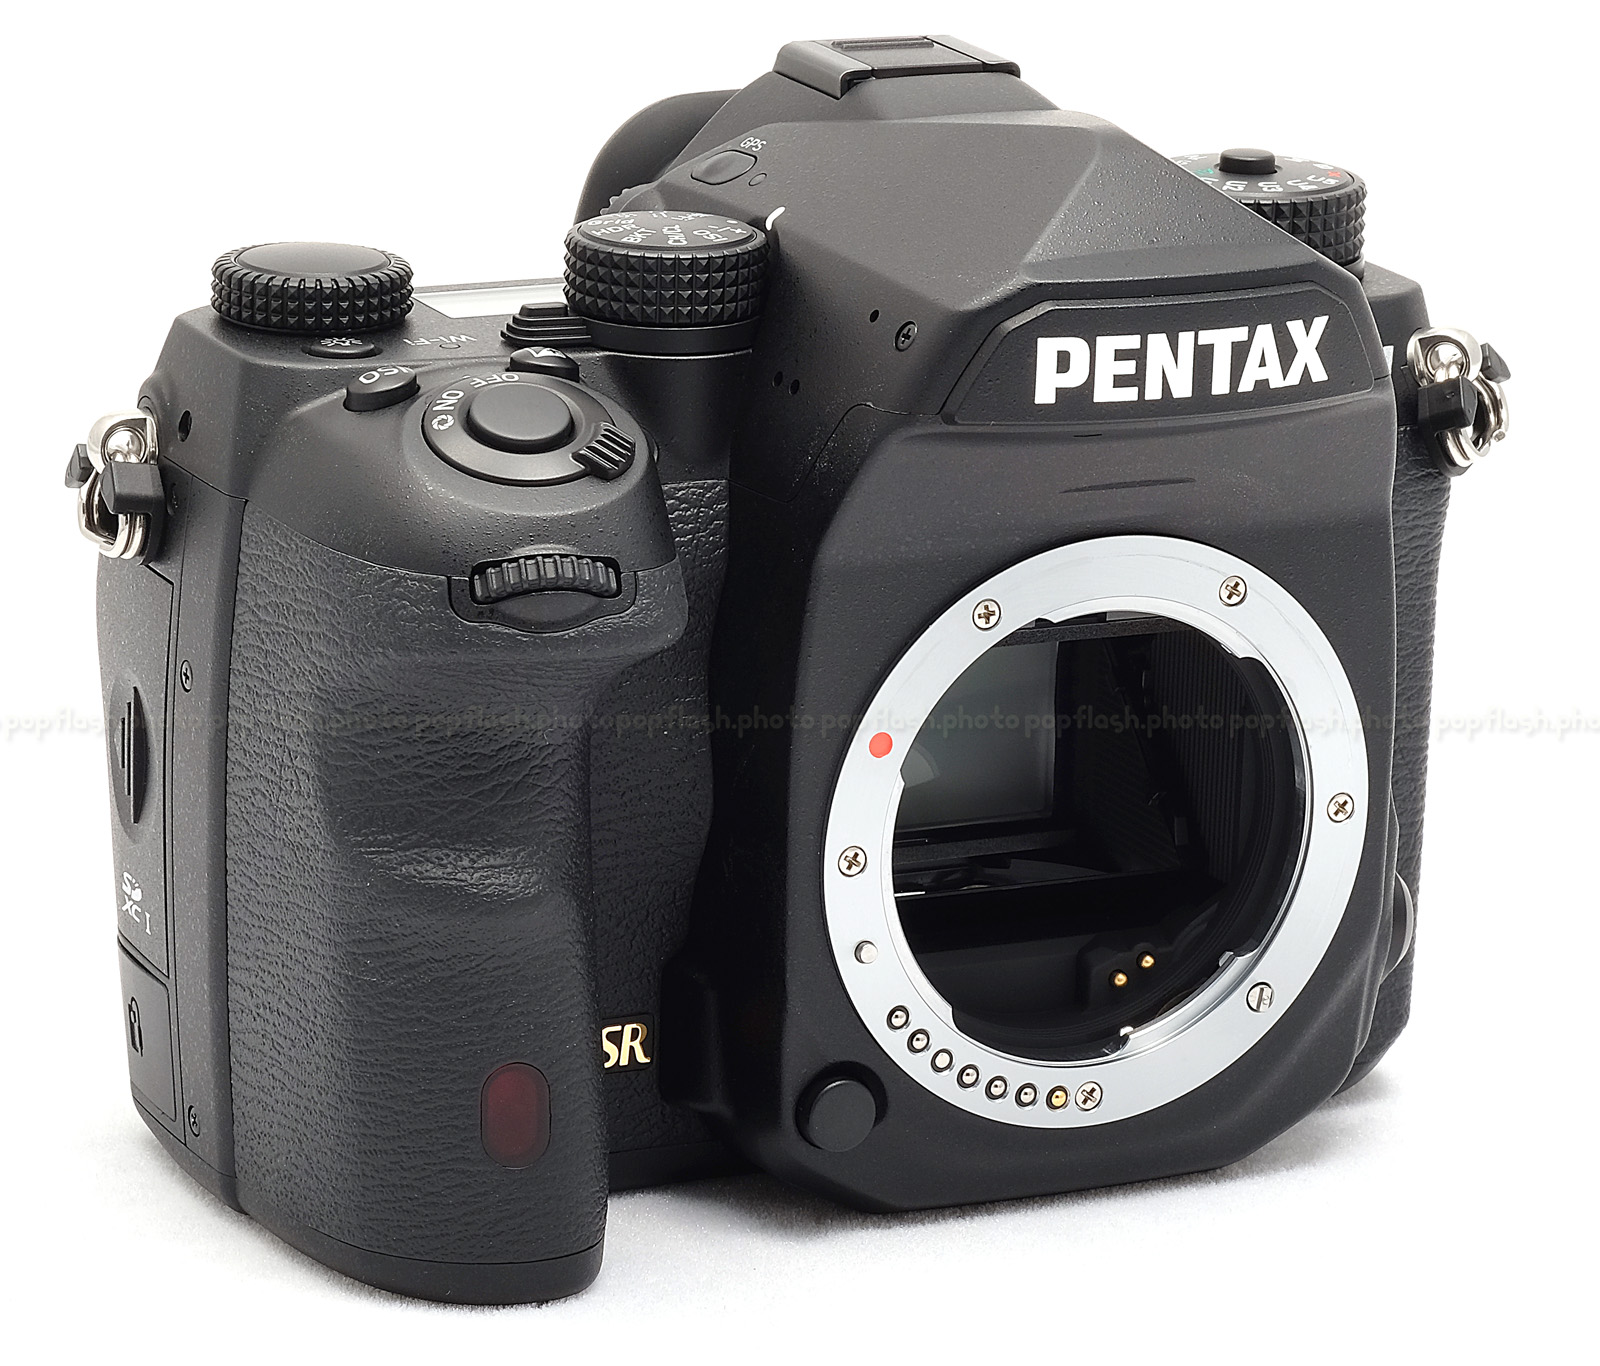 Camera Pentax Dslr Cameras For Sale buy pentax camera online cameras for salepopflash photo